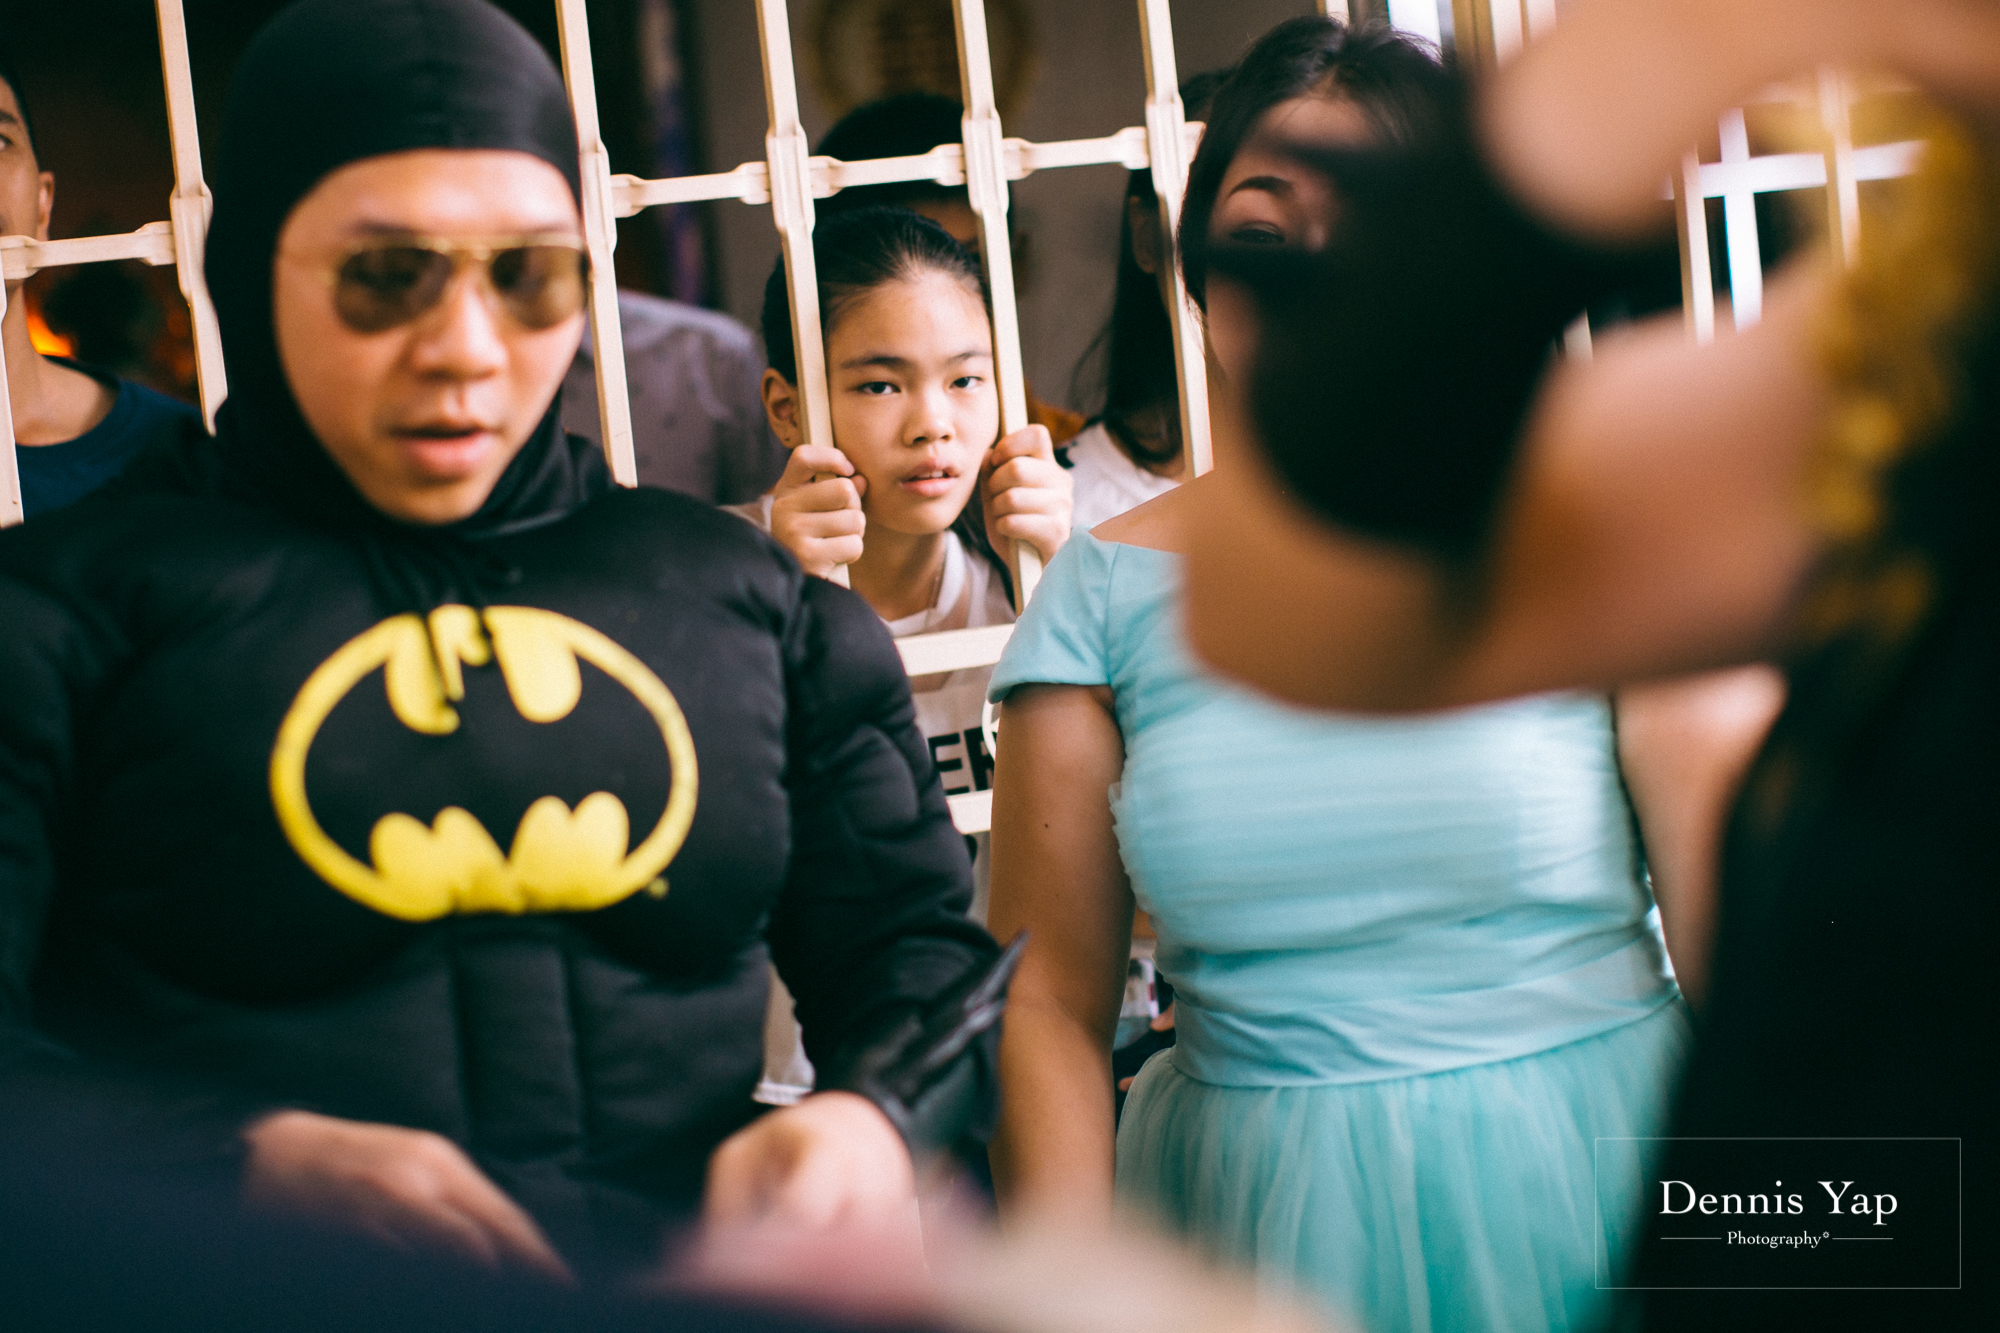 we chard sharon wedding day gate crash majestic hotel kuala lumpur moonlight dennis yap photography malaysia-15.jpg